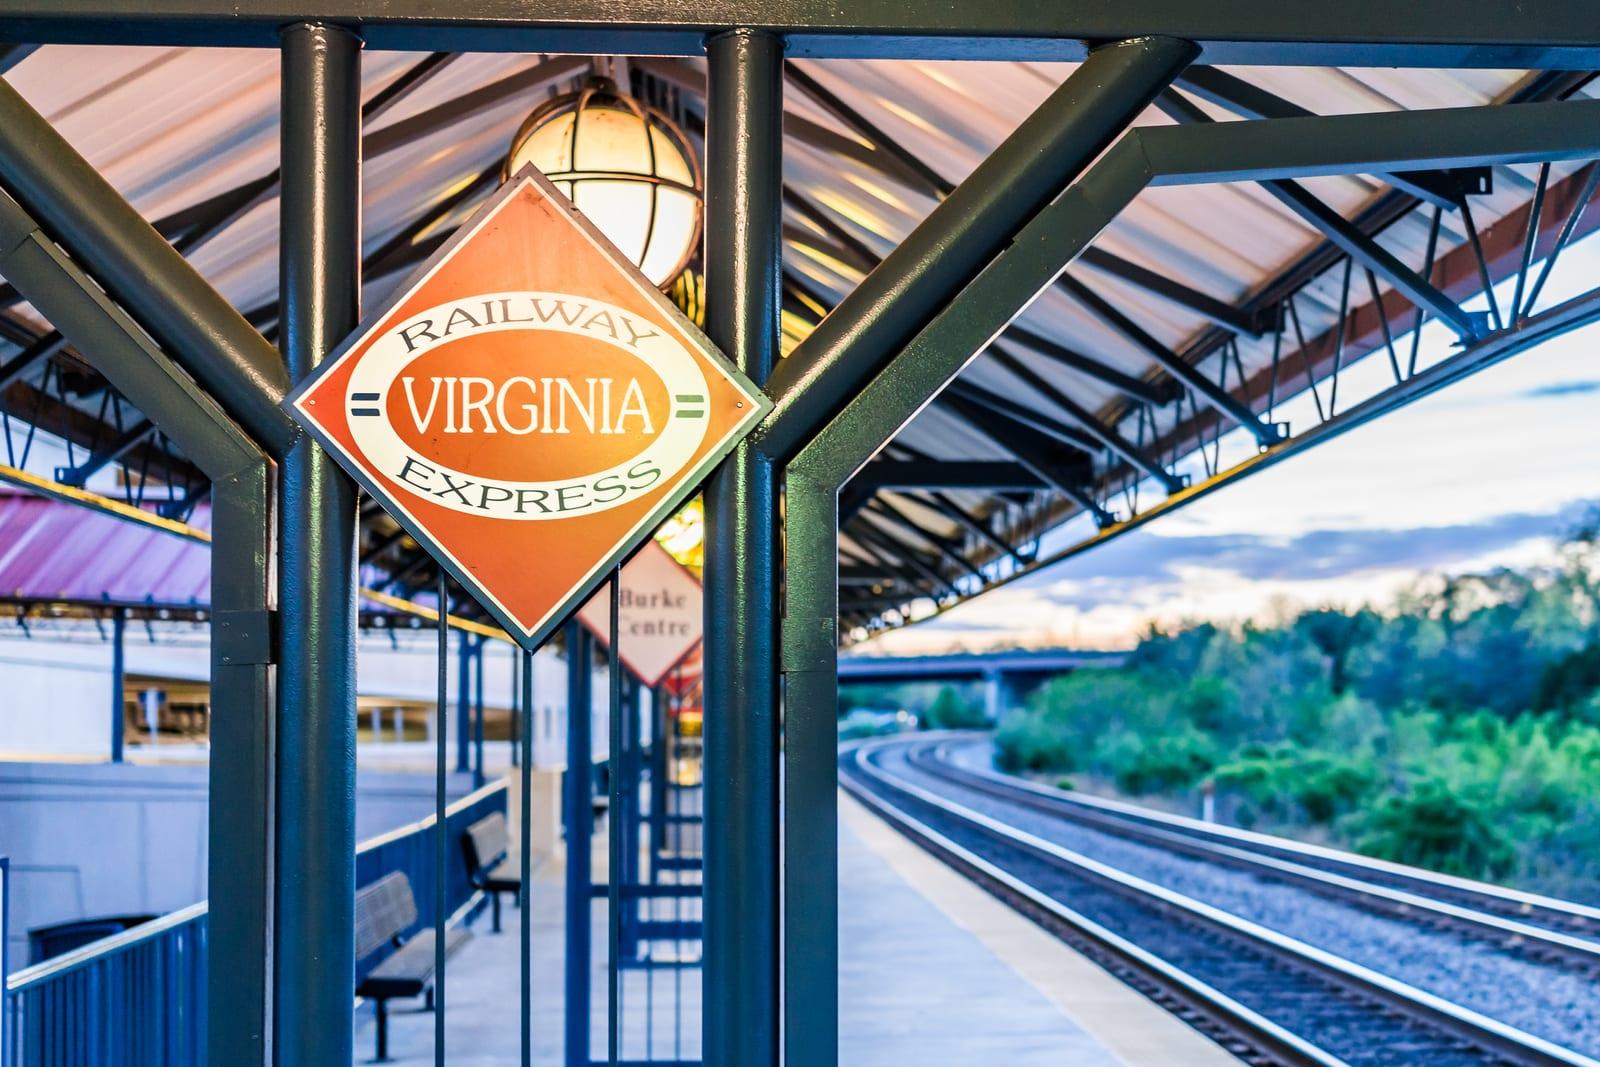 Virginia railway sign